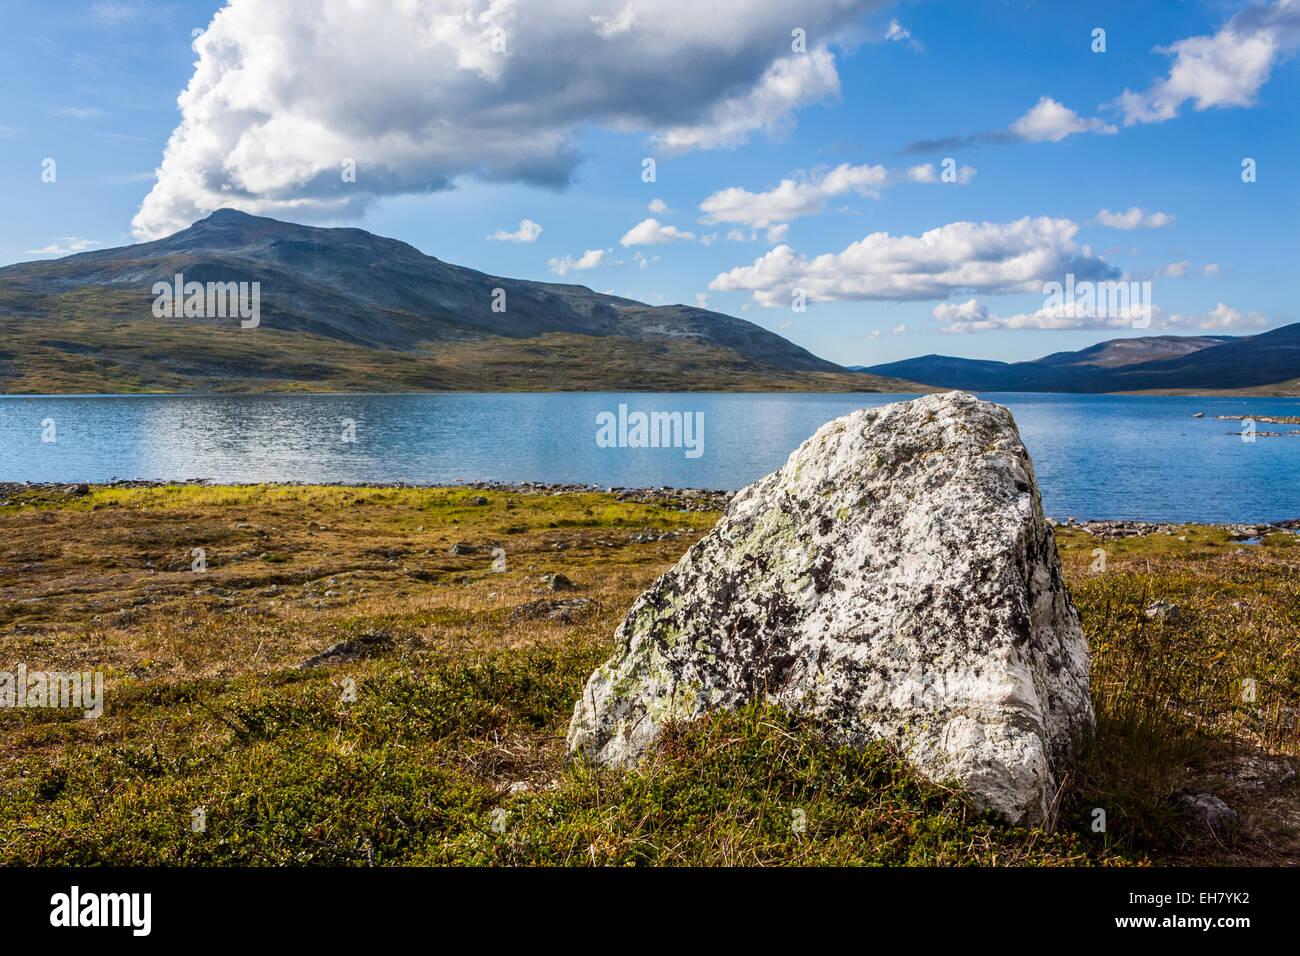 At the shore of Lake Pihtsusjärvi in Finnish Lapland - Stock Image